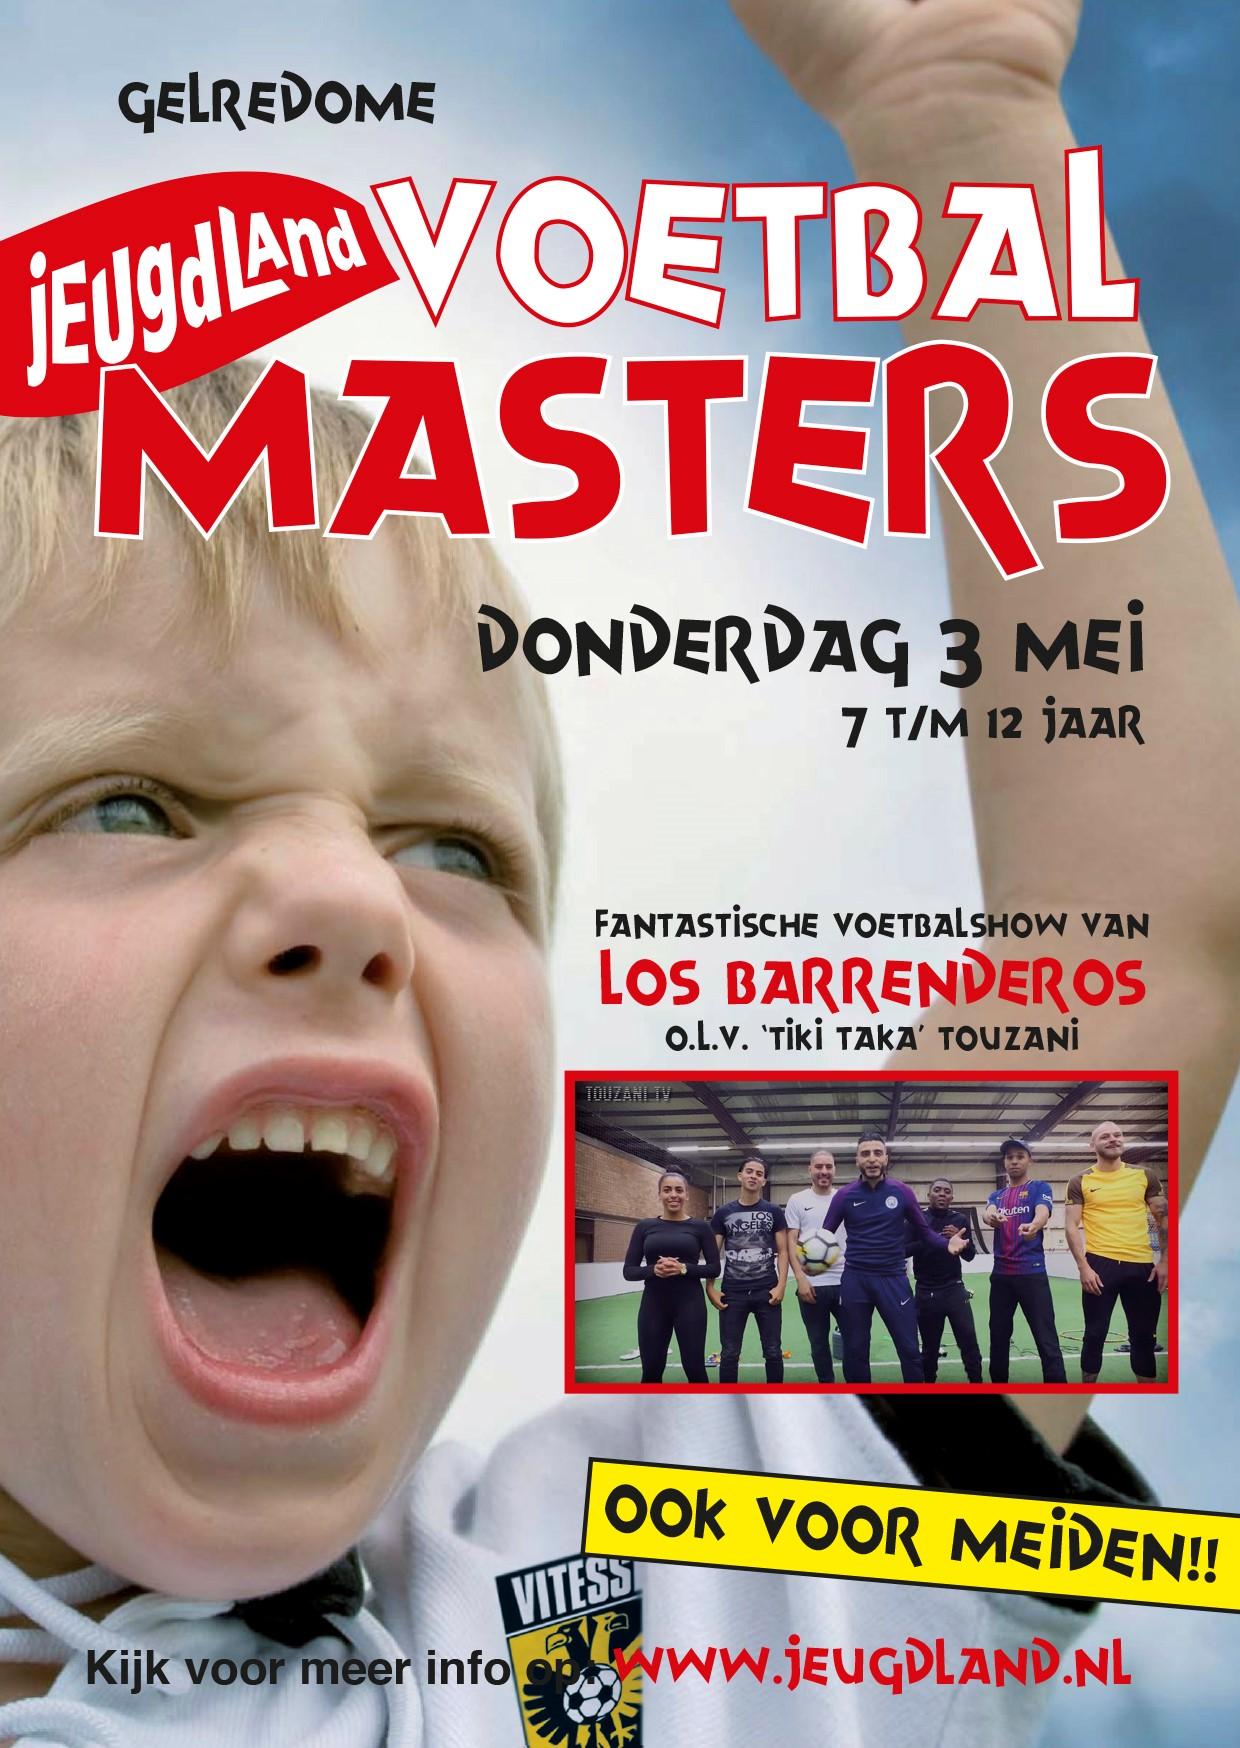 VoetbalMasters